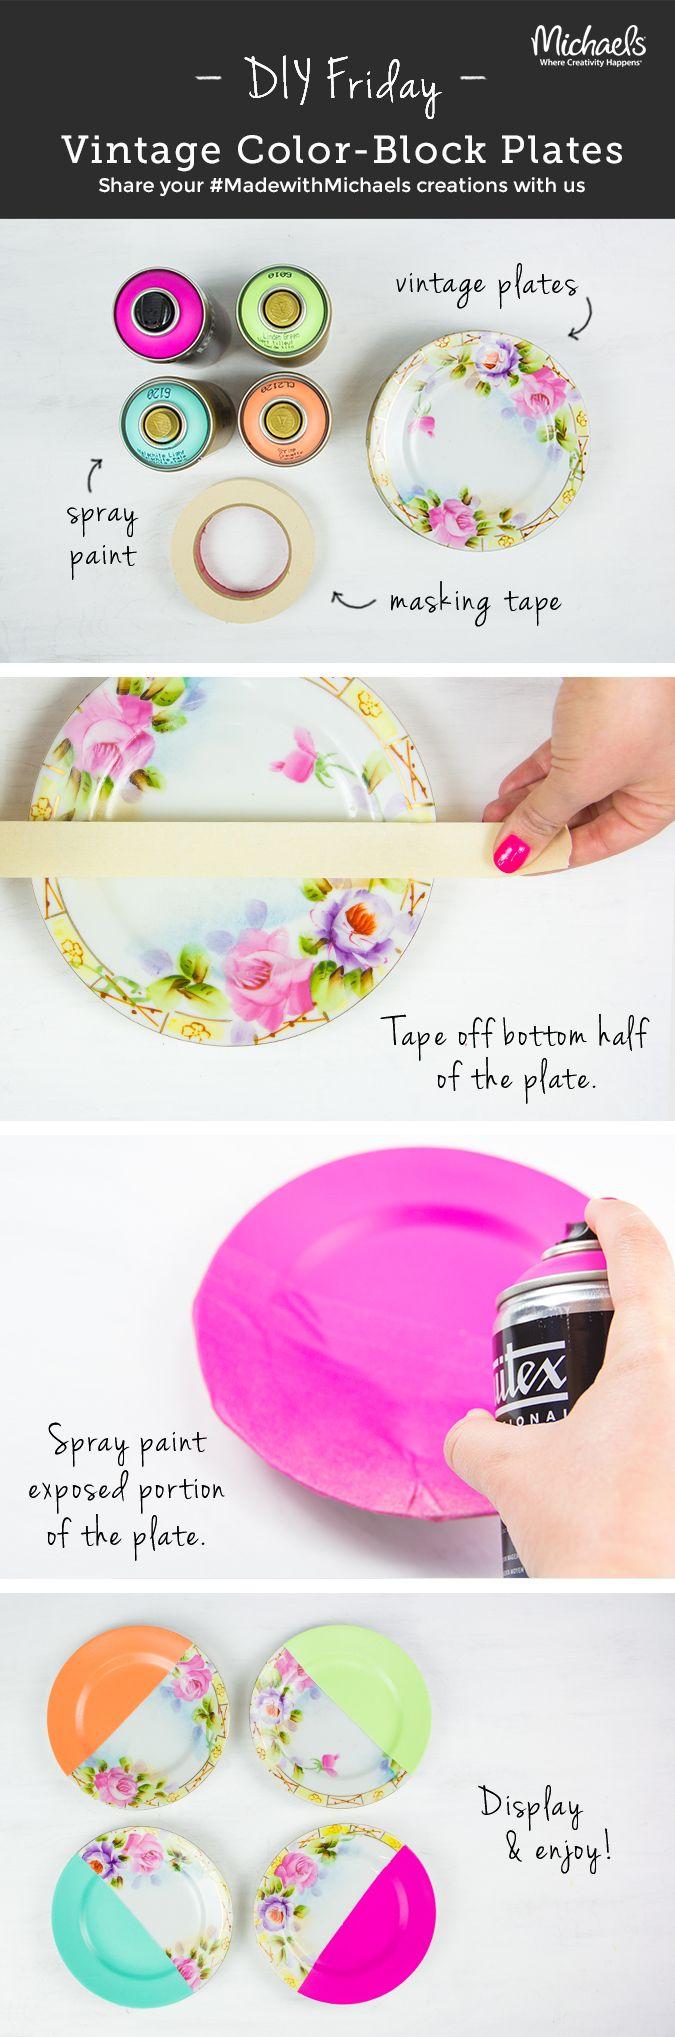 Make It: Vintage Block Colour Plates (no link, self explantory) #diy #home